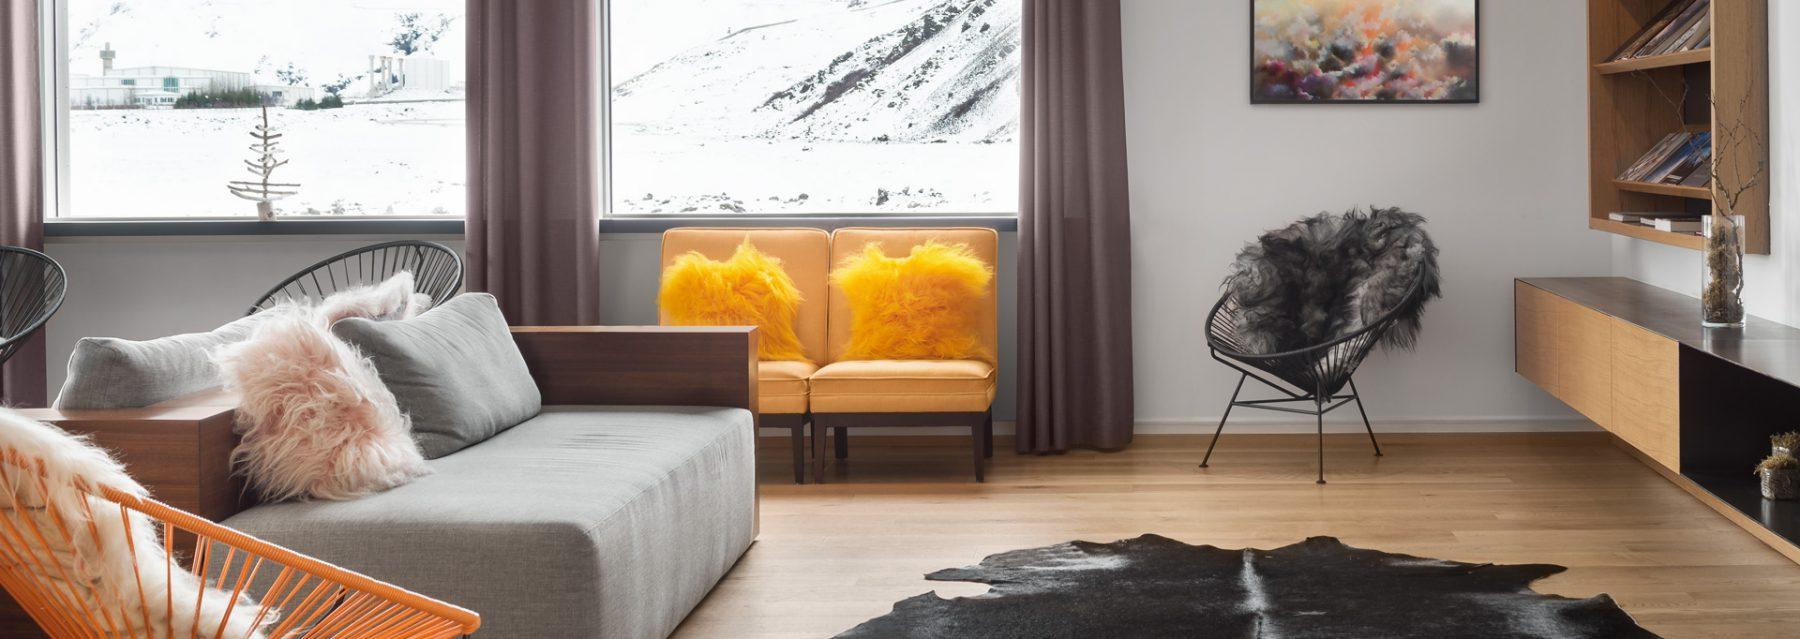 i-on-hotel-iceland-interior-designer-photographer